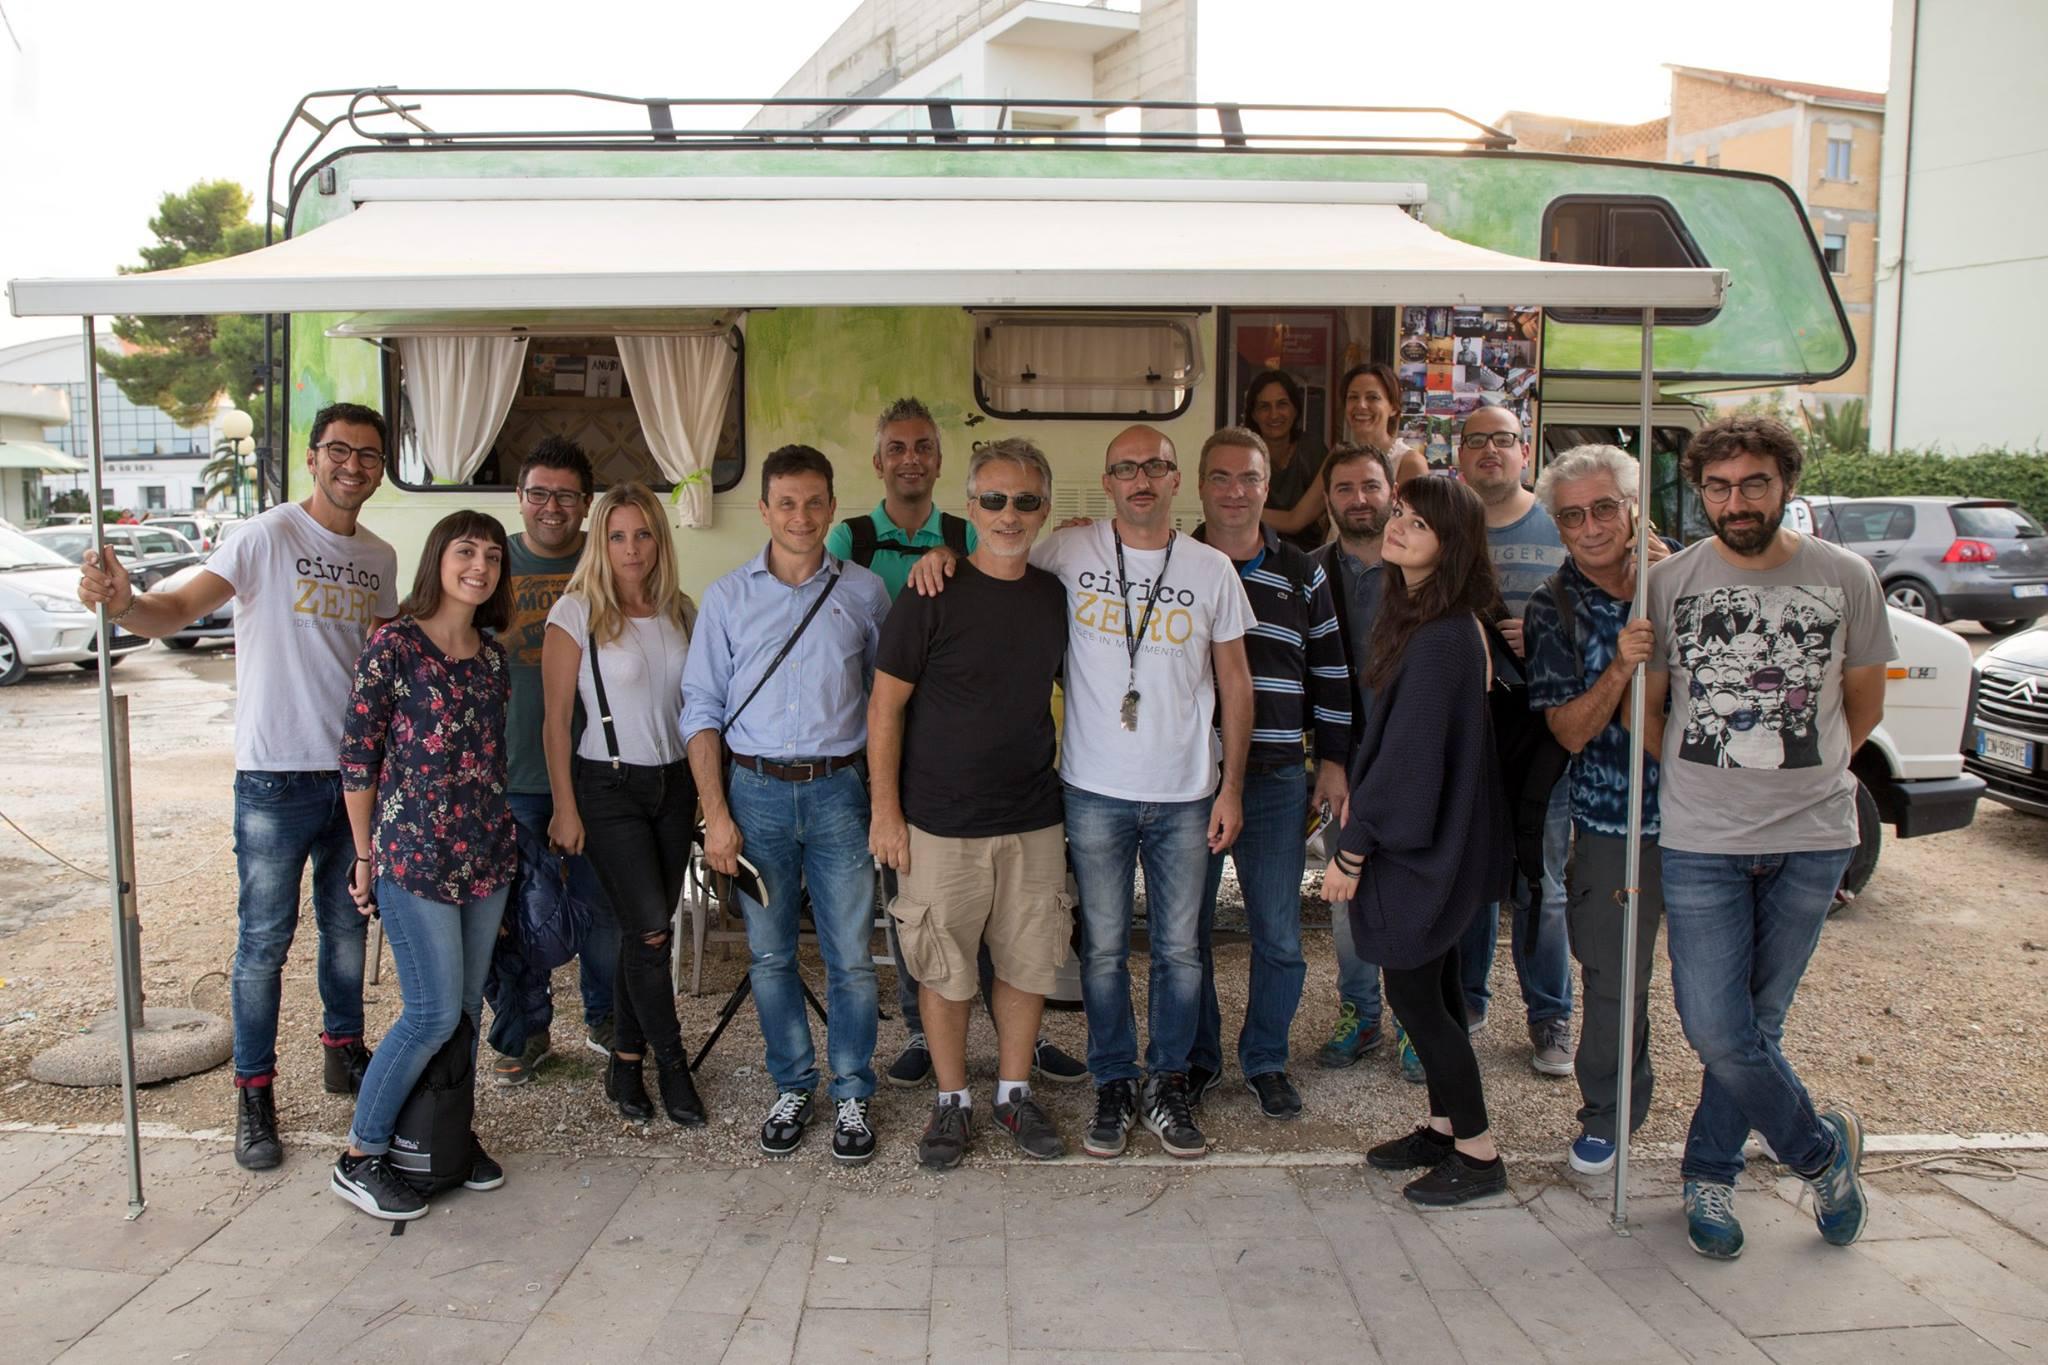 workshop di fotografia - Pescara, settembre 2016